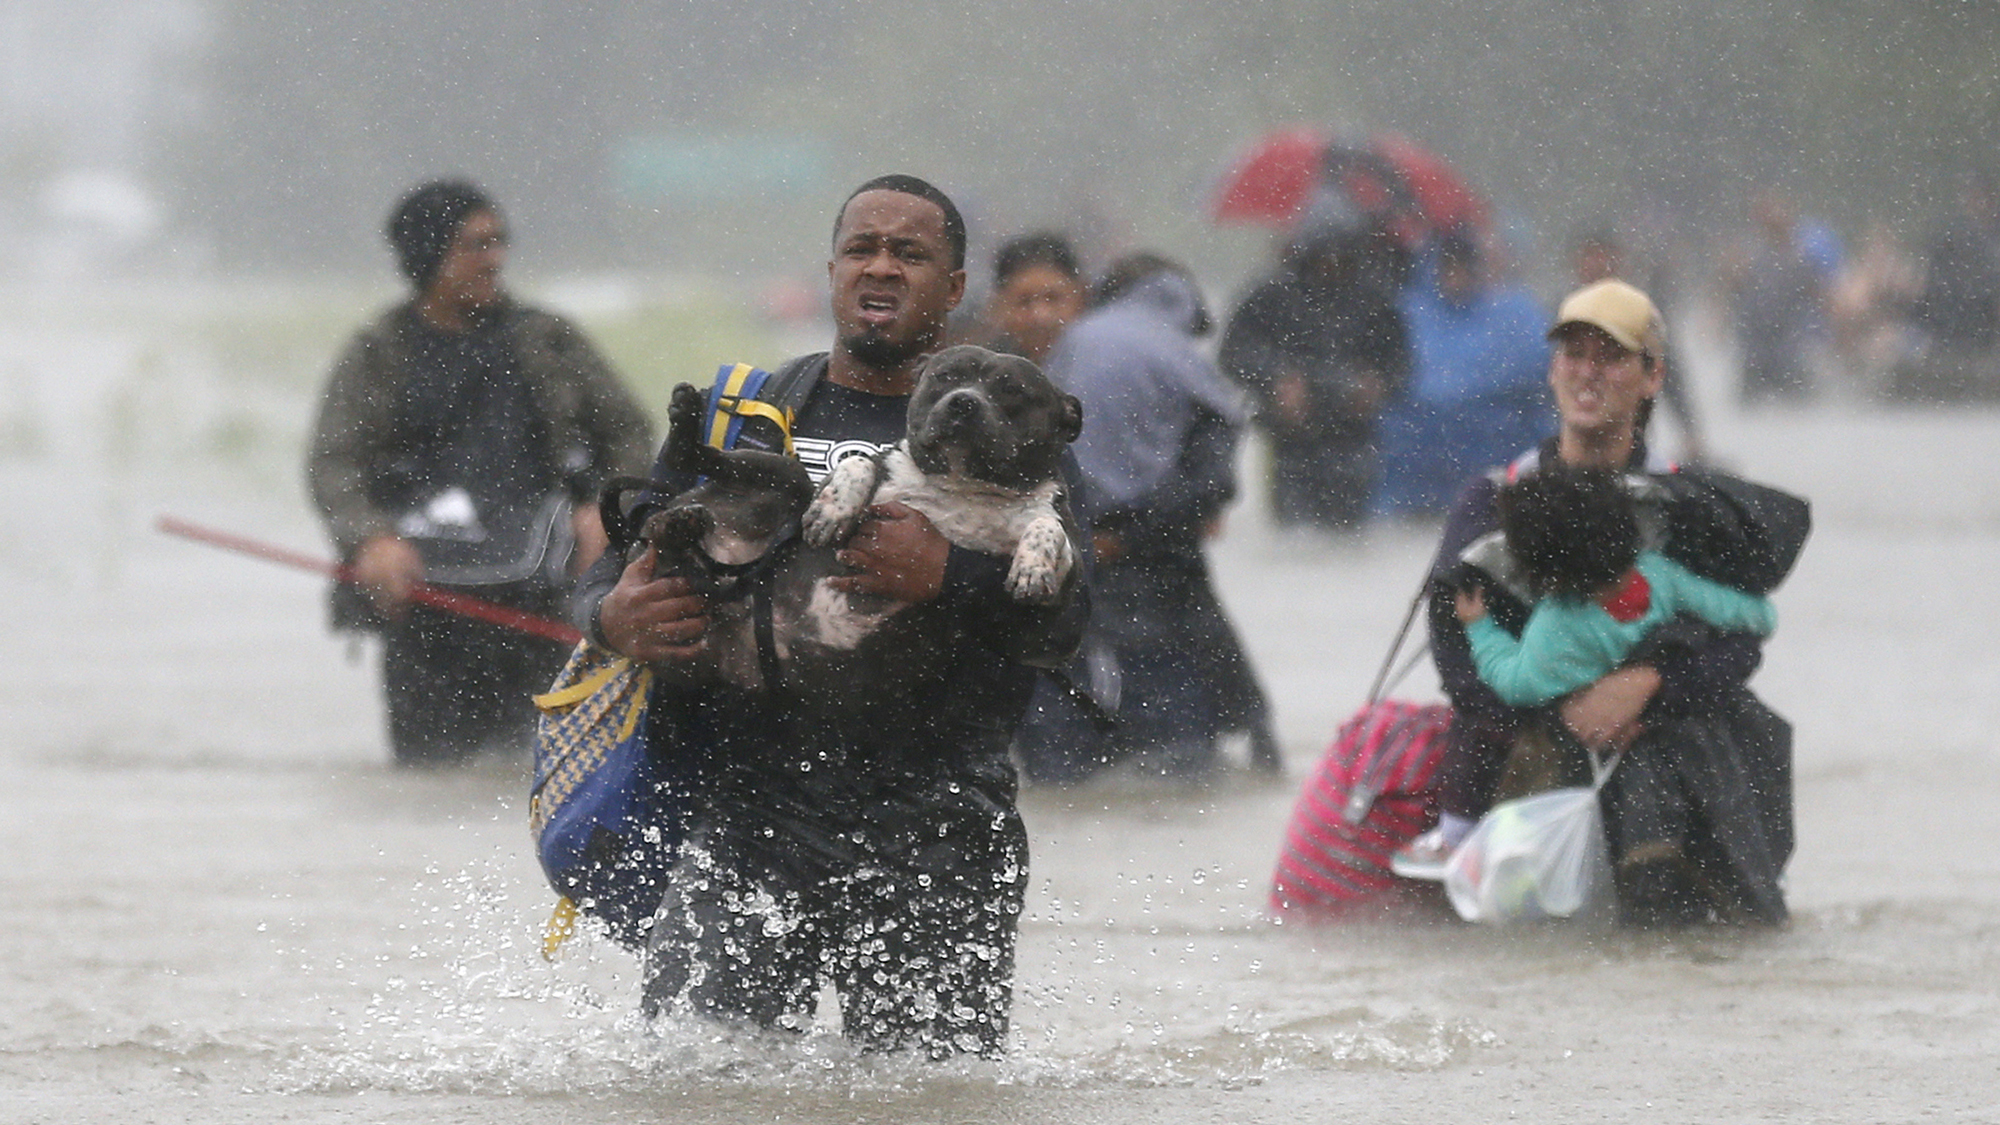 Houston_flooding_04_web.jpg